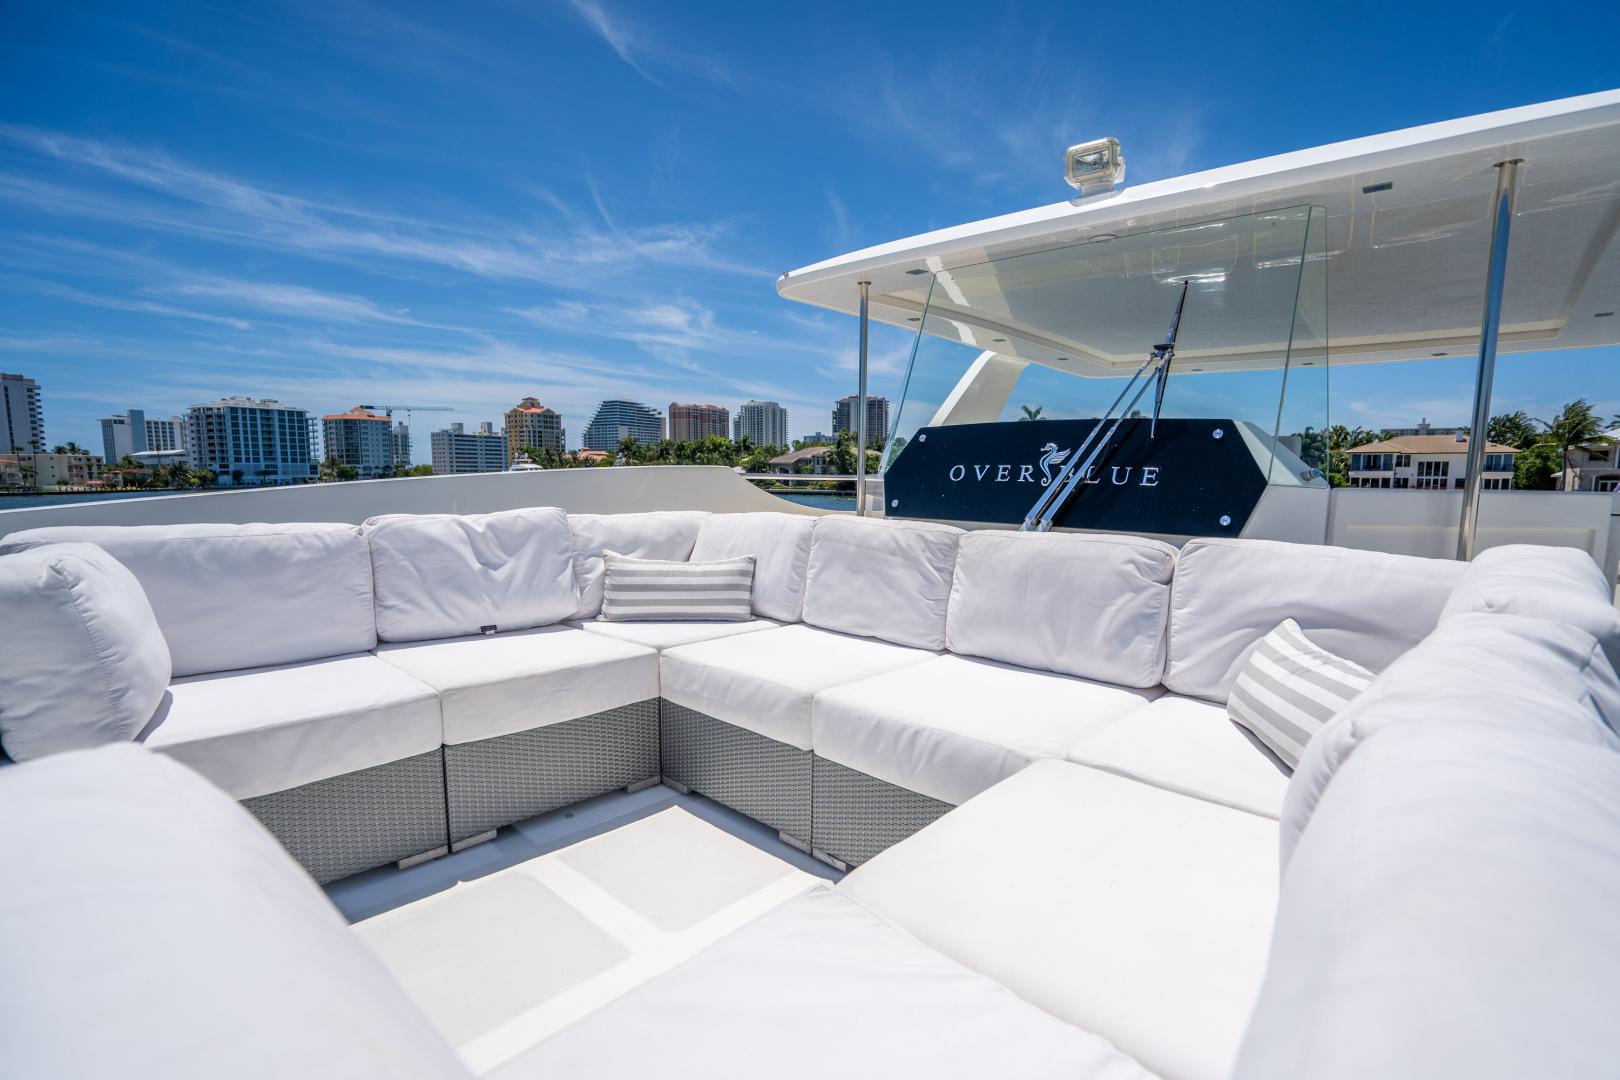 Overblue-58 Power Catamaran 2017-Techuila Ft. Lauderdale-Florida-United States-2017 Overblue 58 Powercat-1401236   Thumbnail